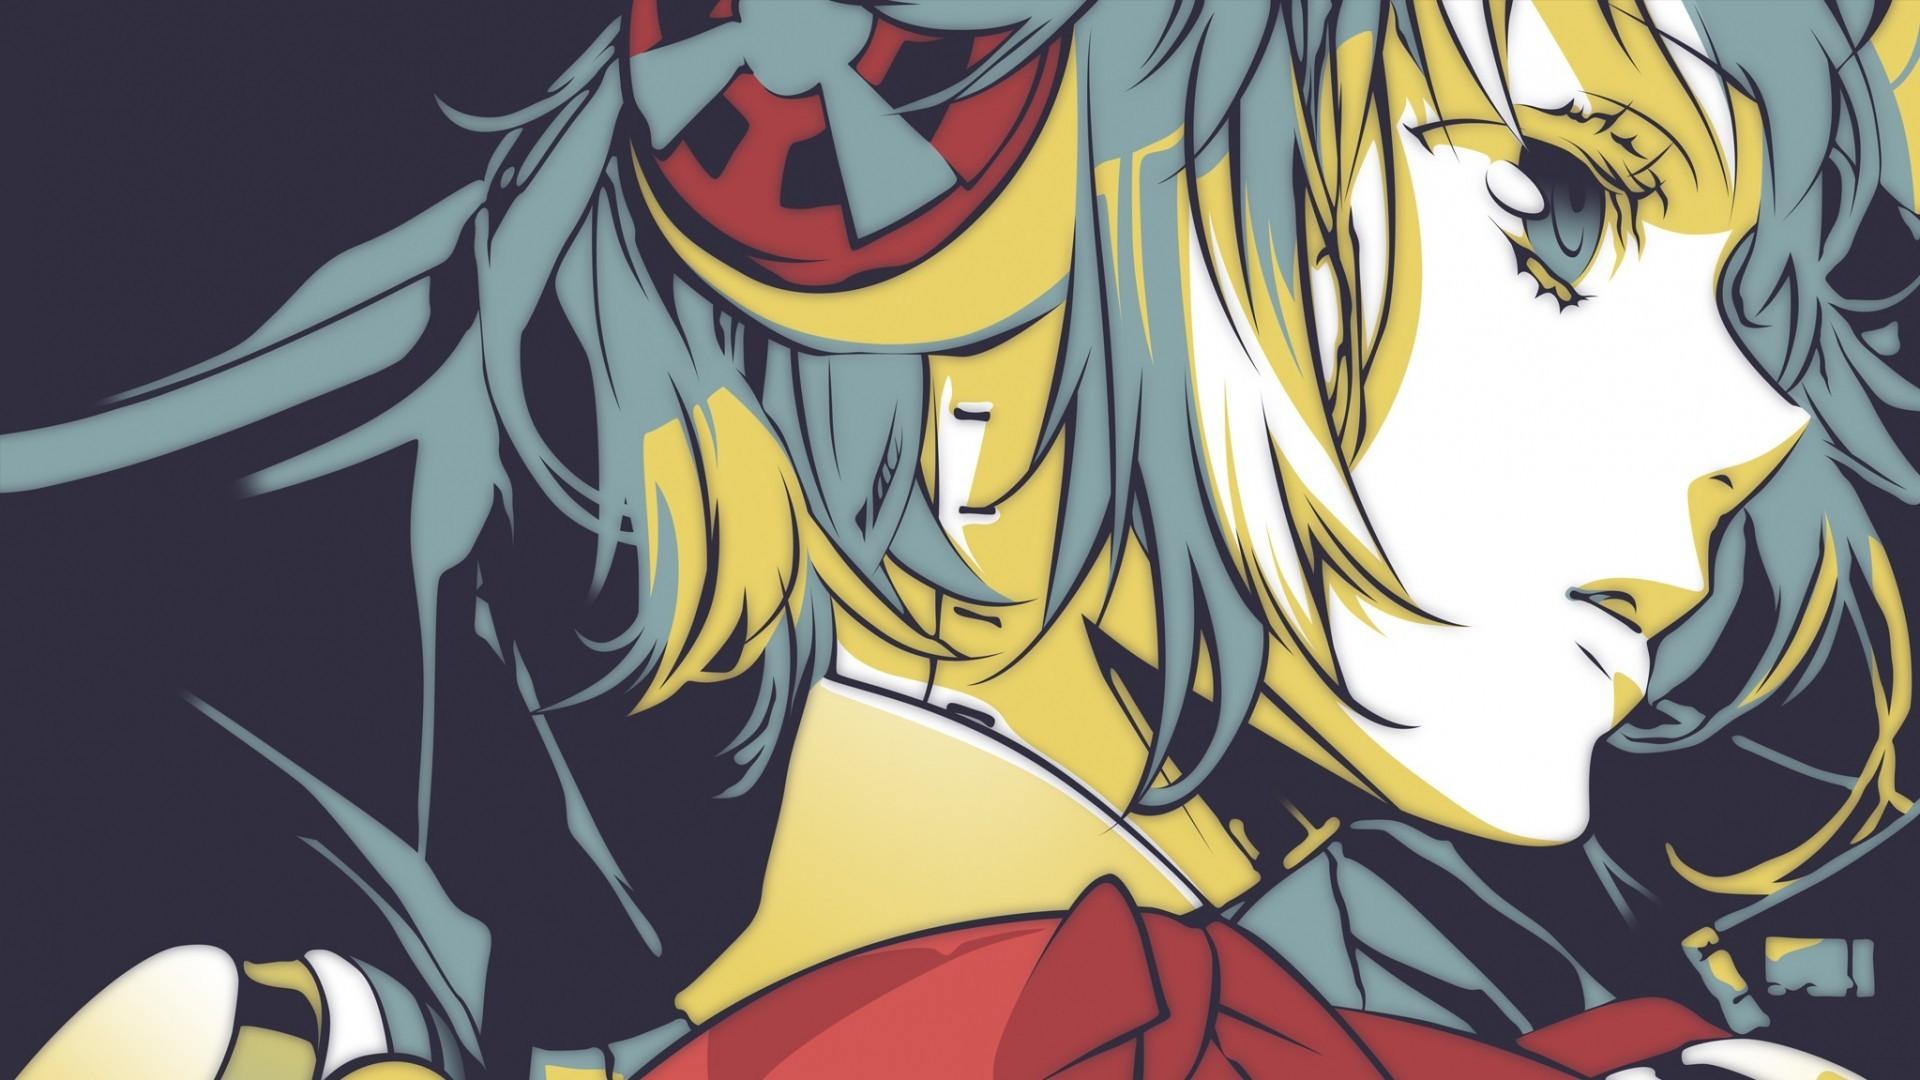 Wallpaper Illustration Video Games Anime Girls Manga